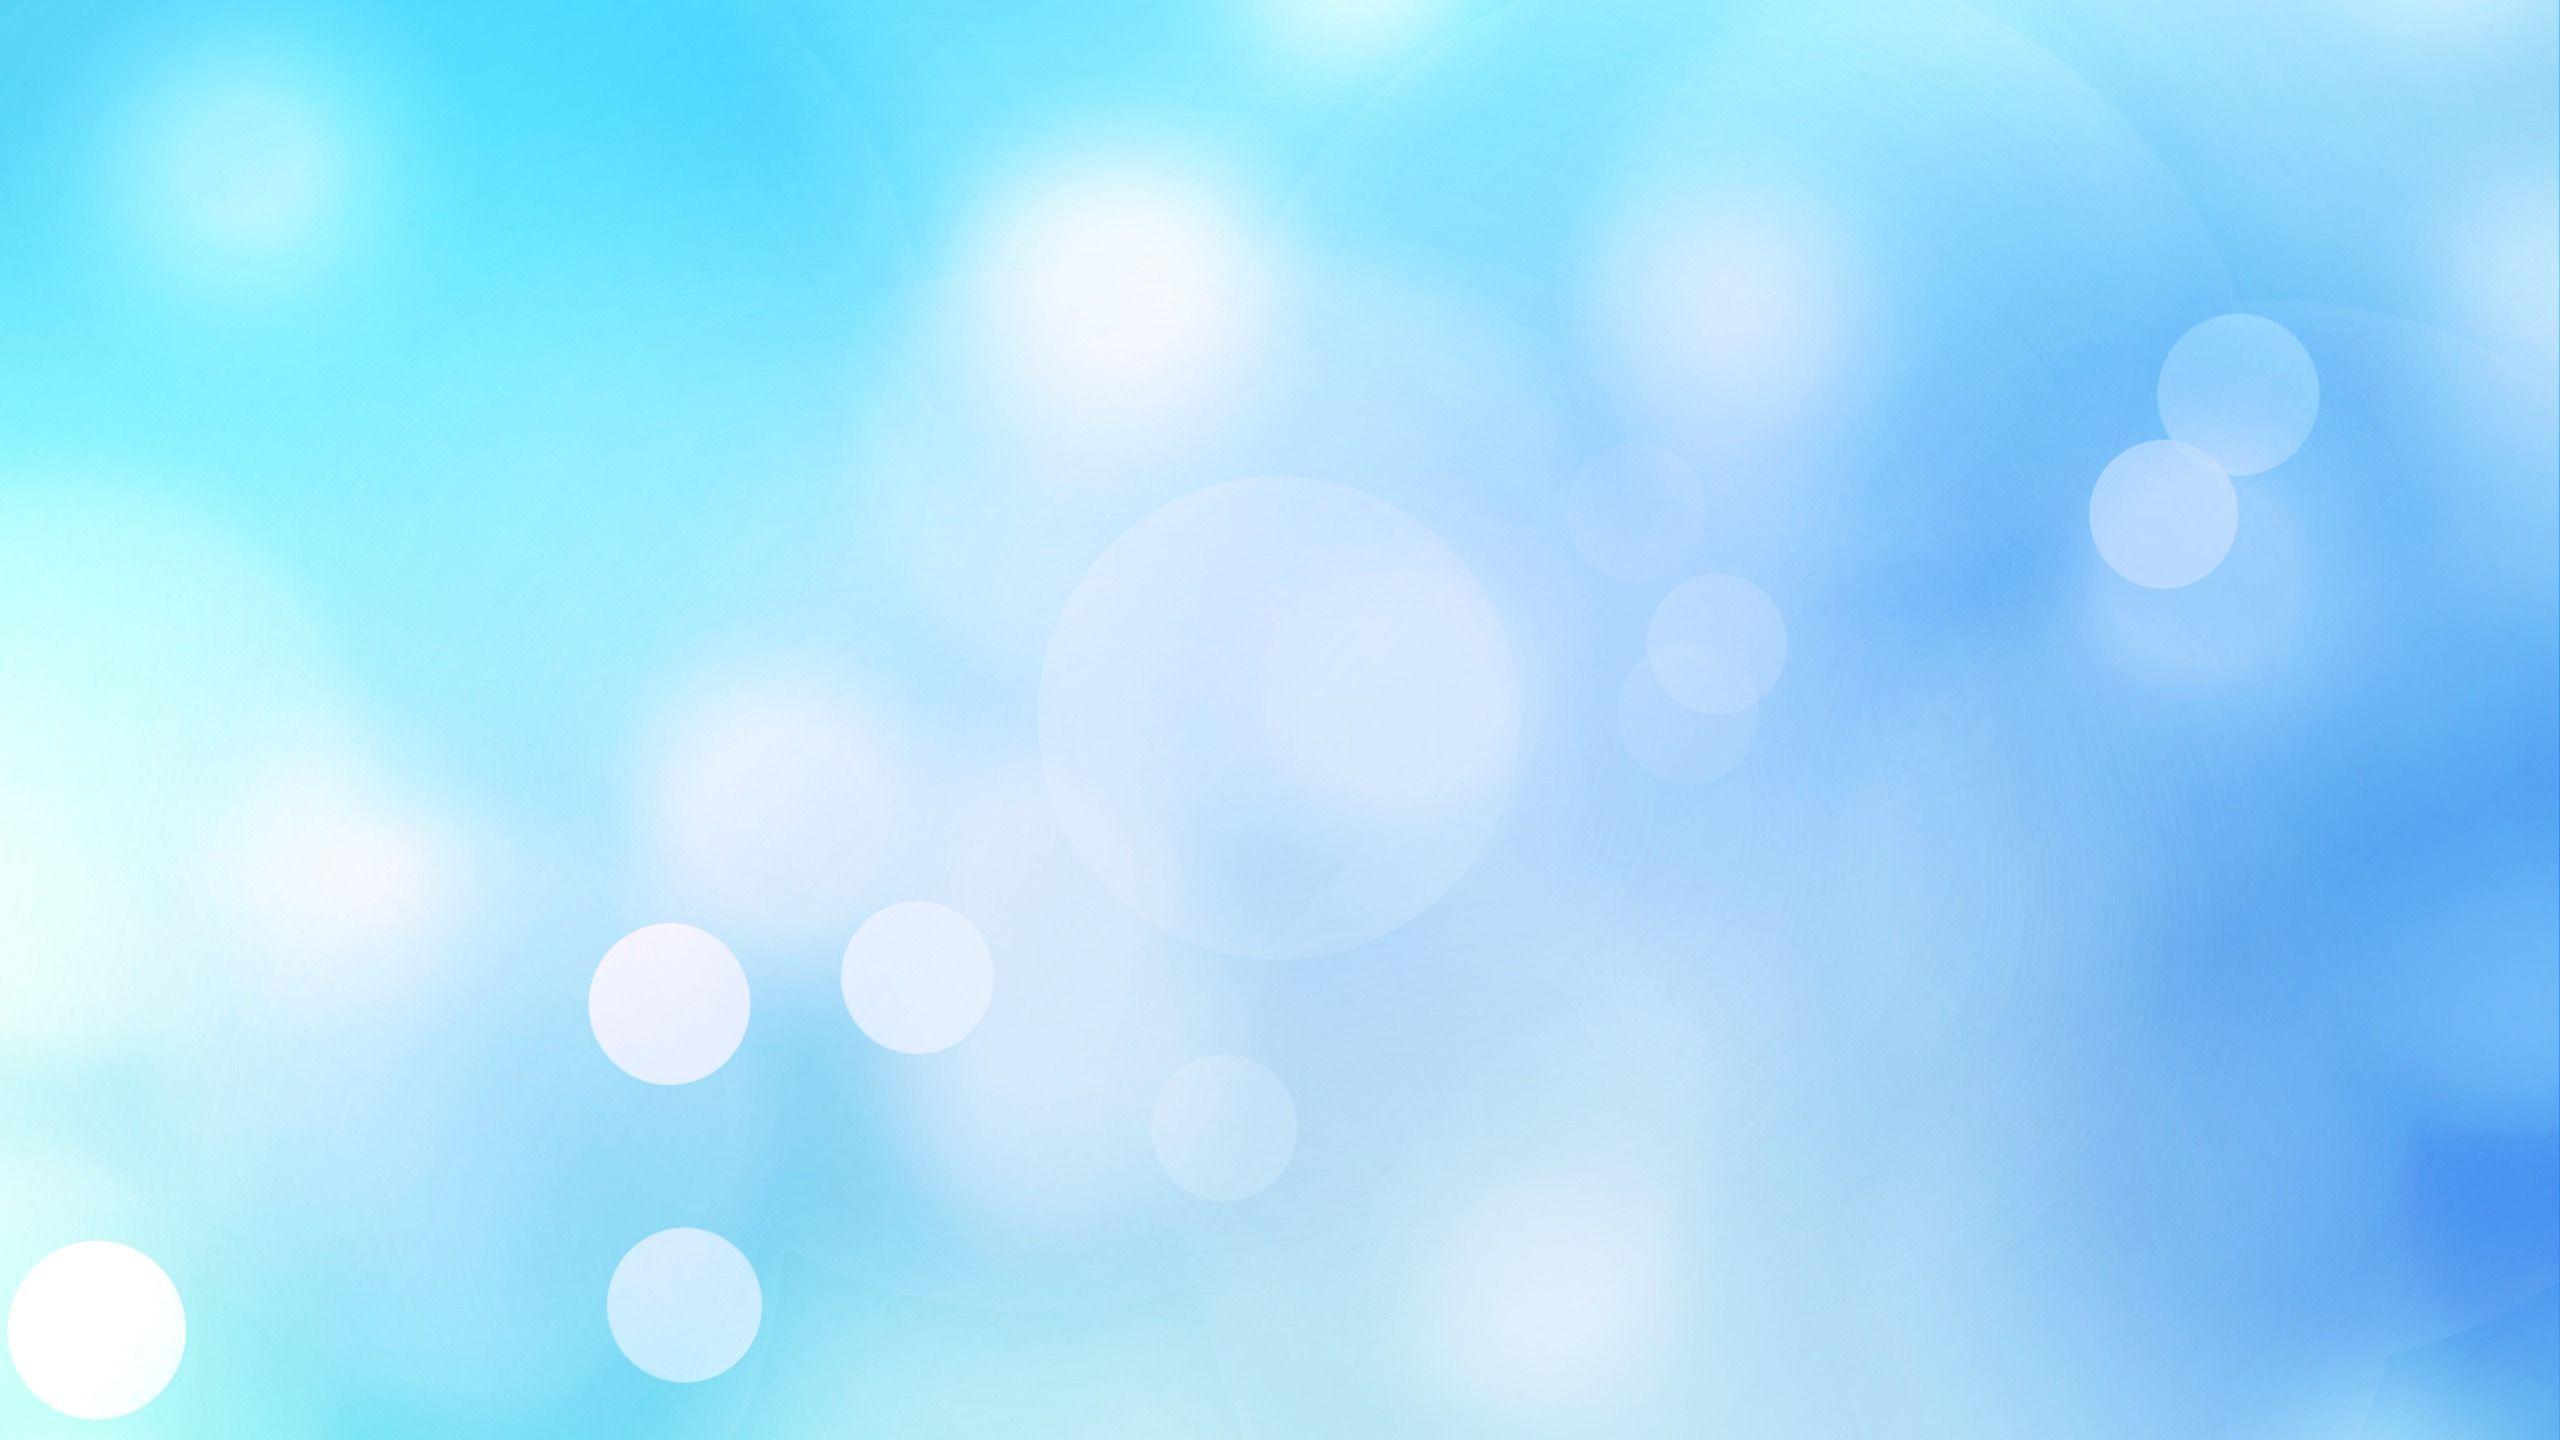 Light Blue Wallpapers Top Free Light Blue Backgrounds